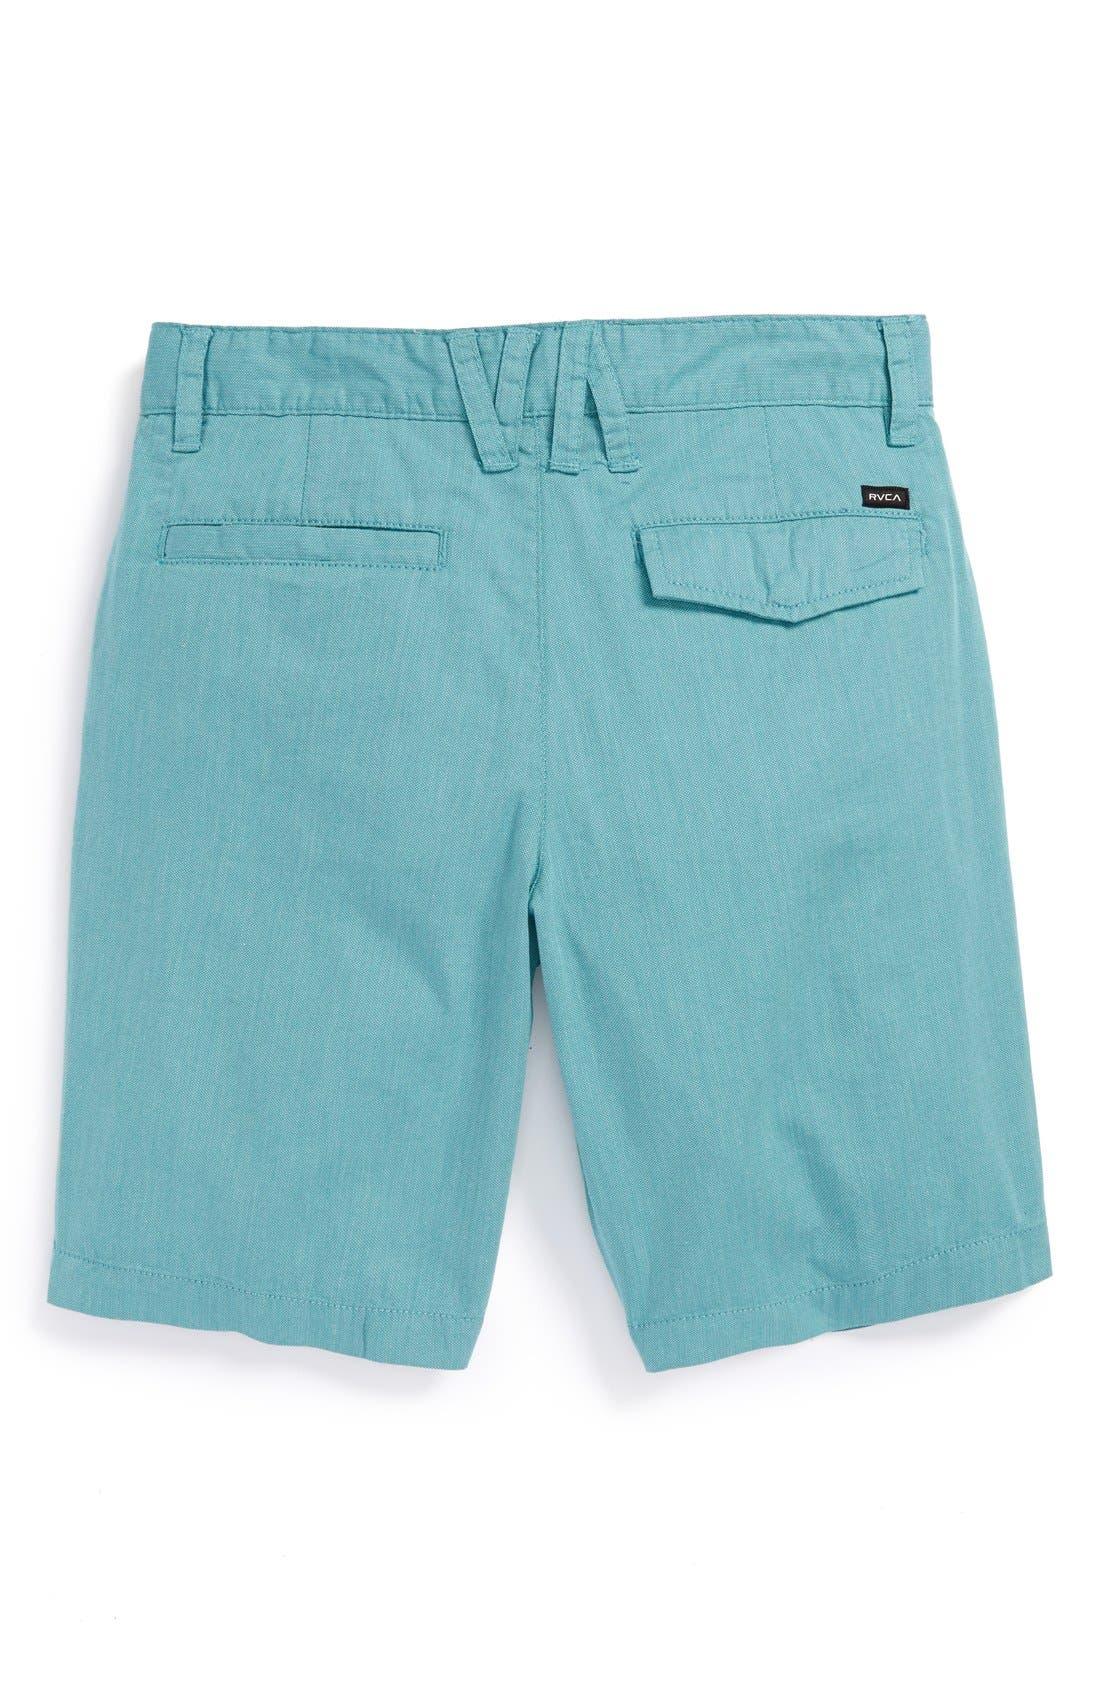 Alternate Image 2  - RVCA 'Fracture' Shorts (Big Boys)